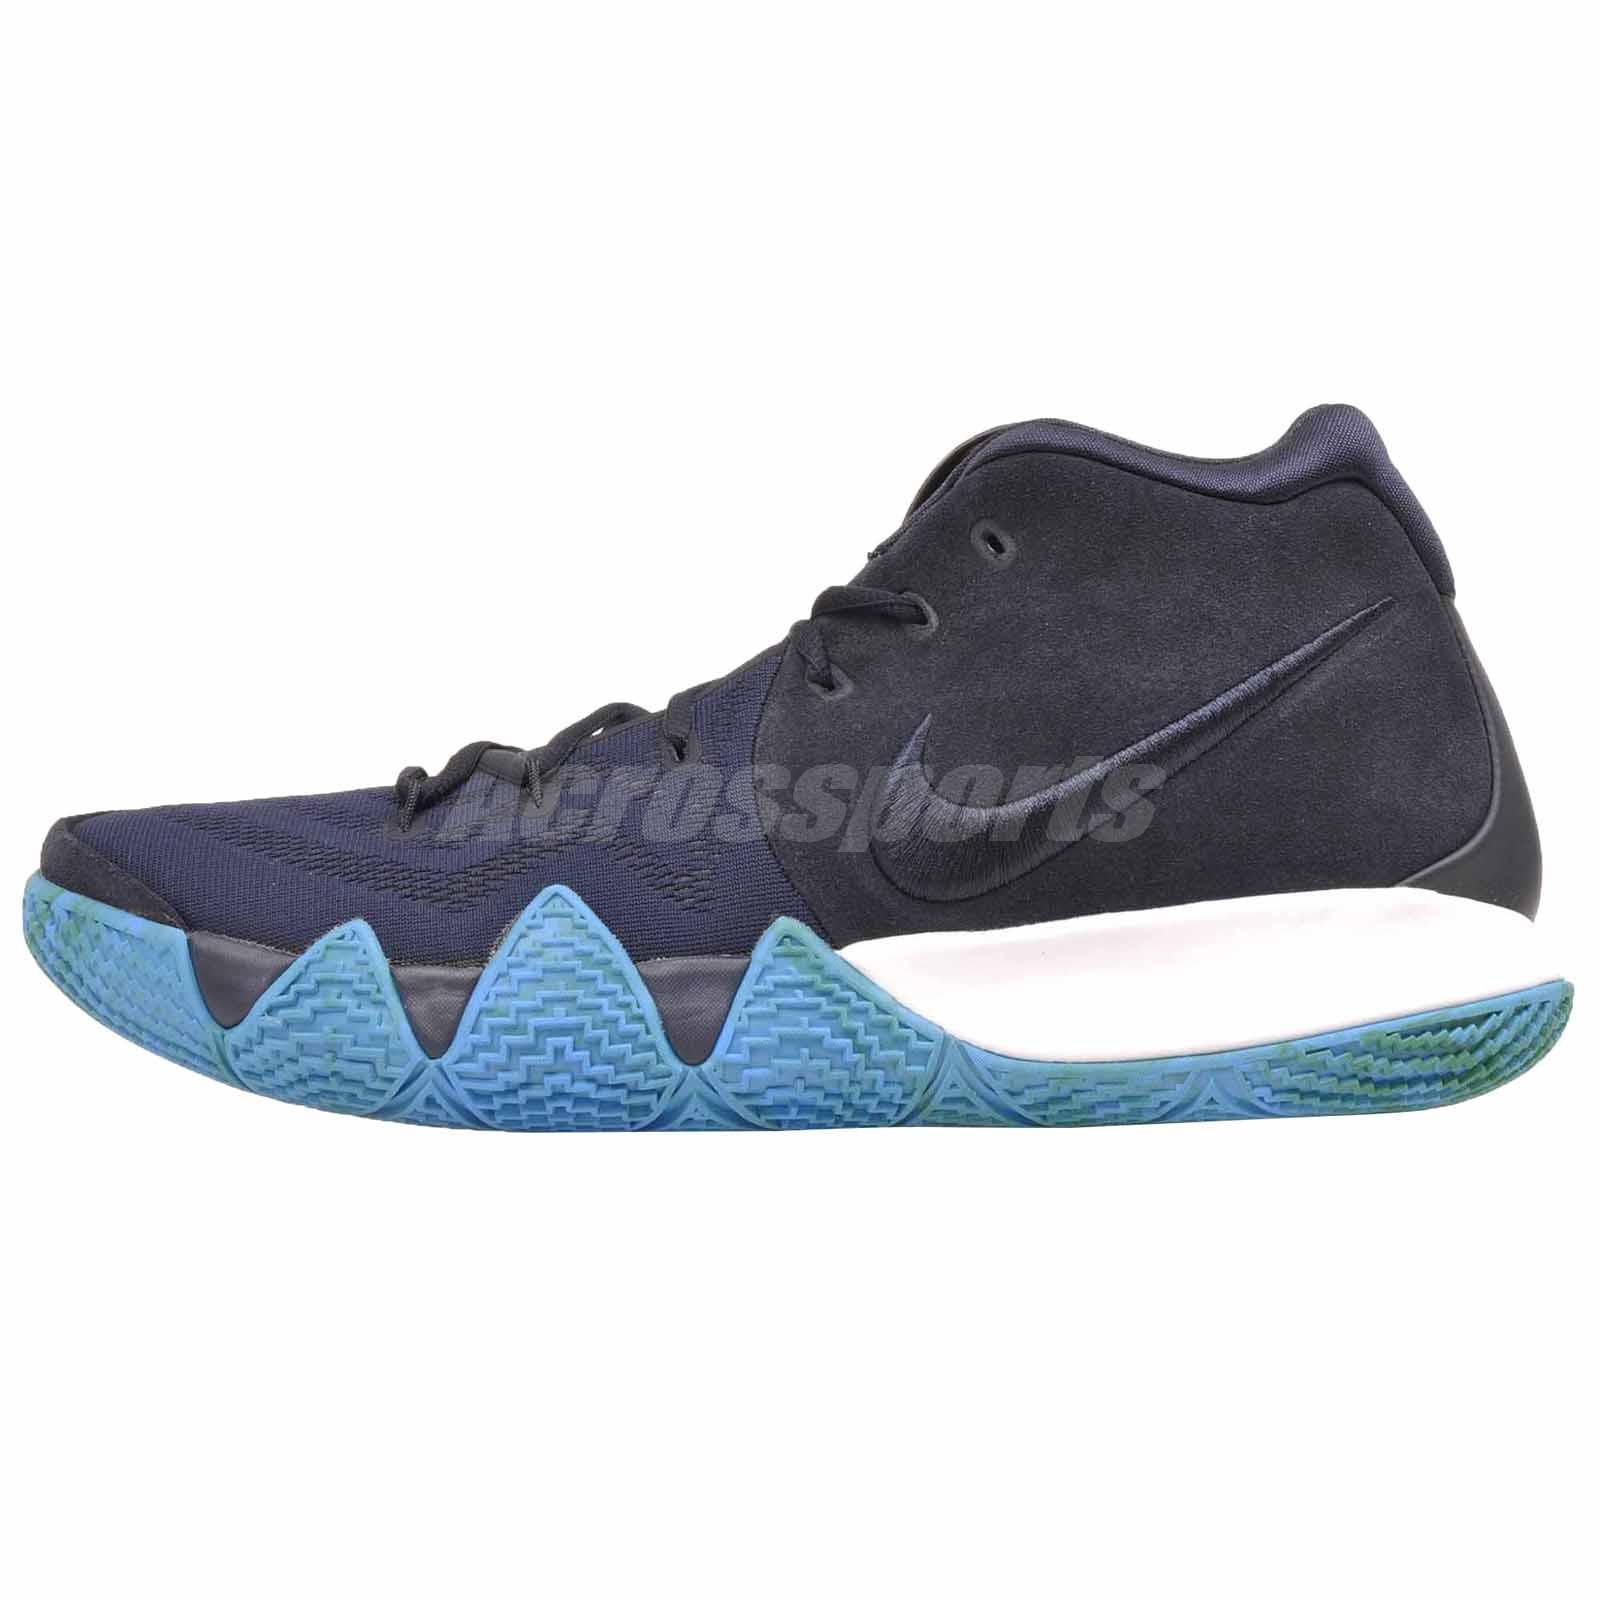 b86992ef8e0 good 2018 nike kyrie 4 34206 29d47  wholesale nike kyrie 4 basketball mens  shoes dark obsidian blue 943806 401 6e2df 48af3